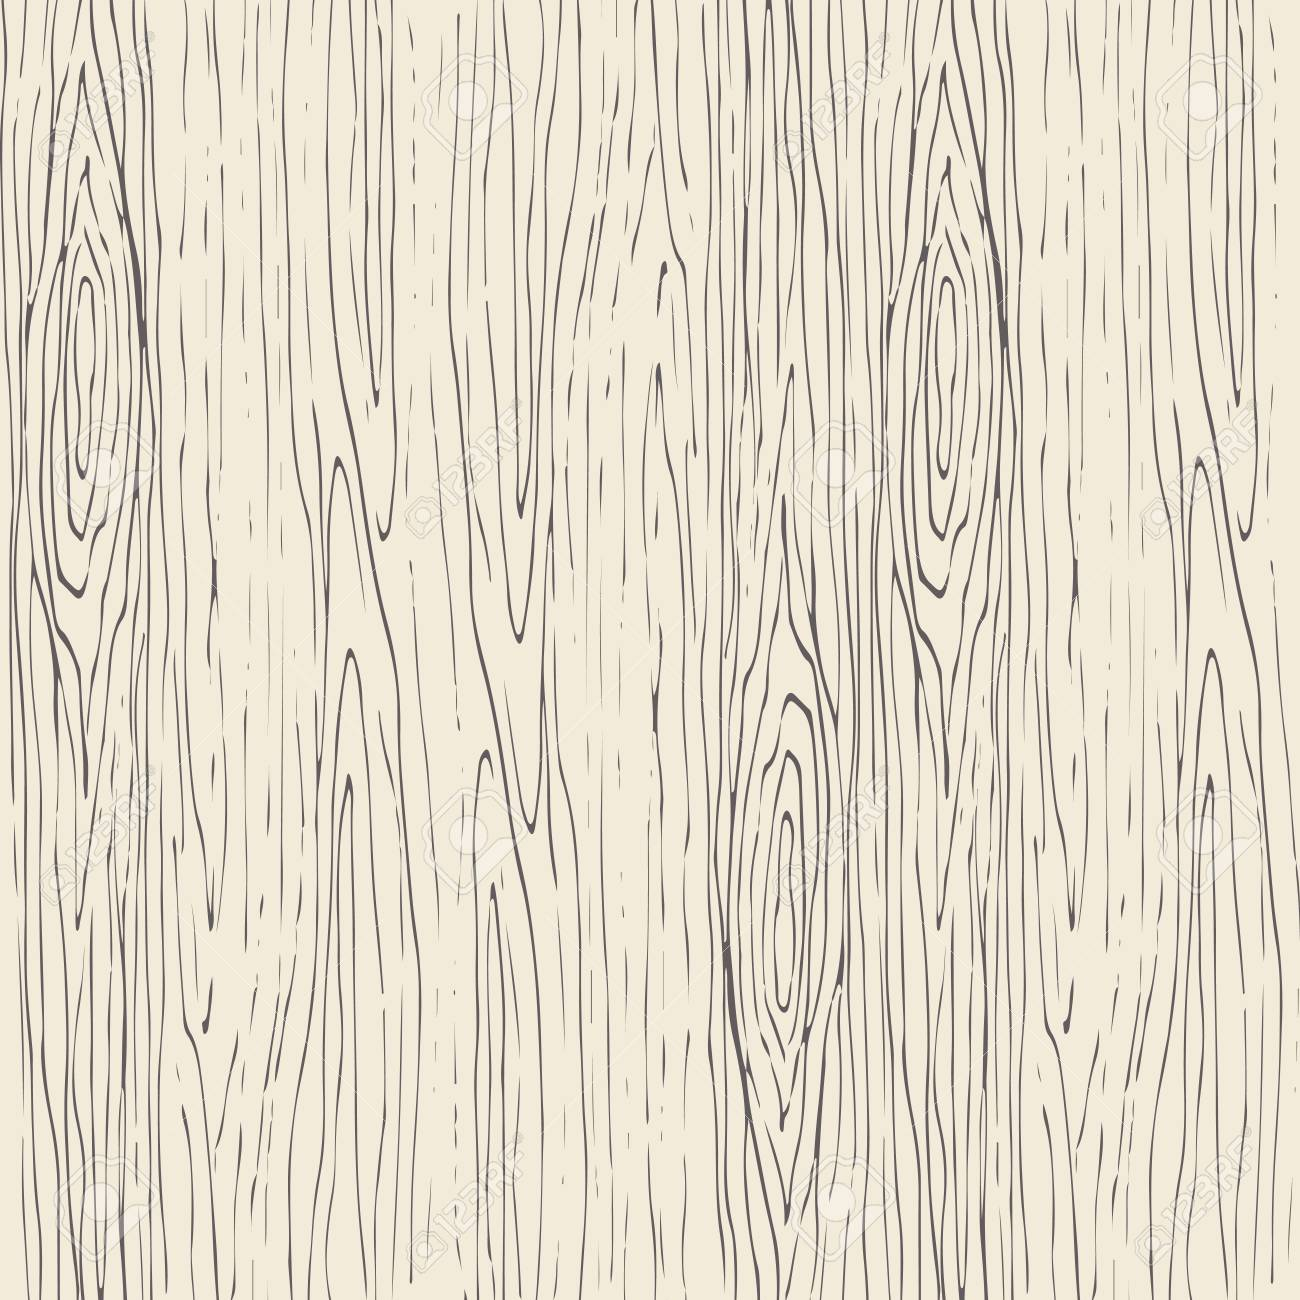 Seamless wood grain texture Teak Wood Seamless Wood Grain Pattern Wooden Texture Light Beige And Gray Vector Background Stock Vector 123rfcom Seamless Wood Grain Pattern Wooden Texture Light Beige And Gray